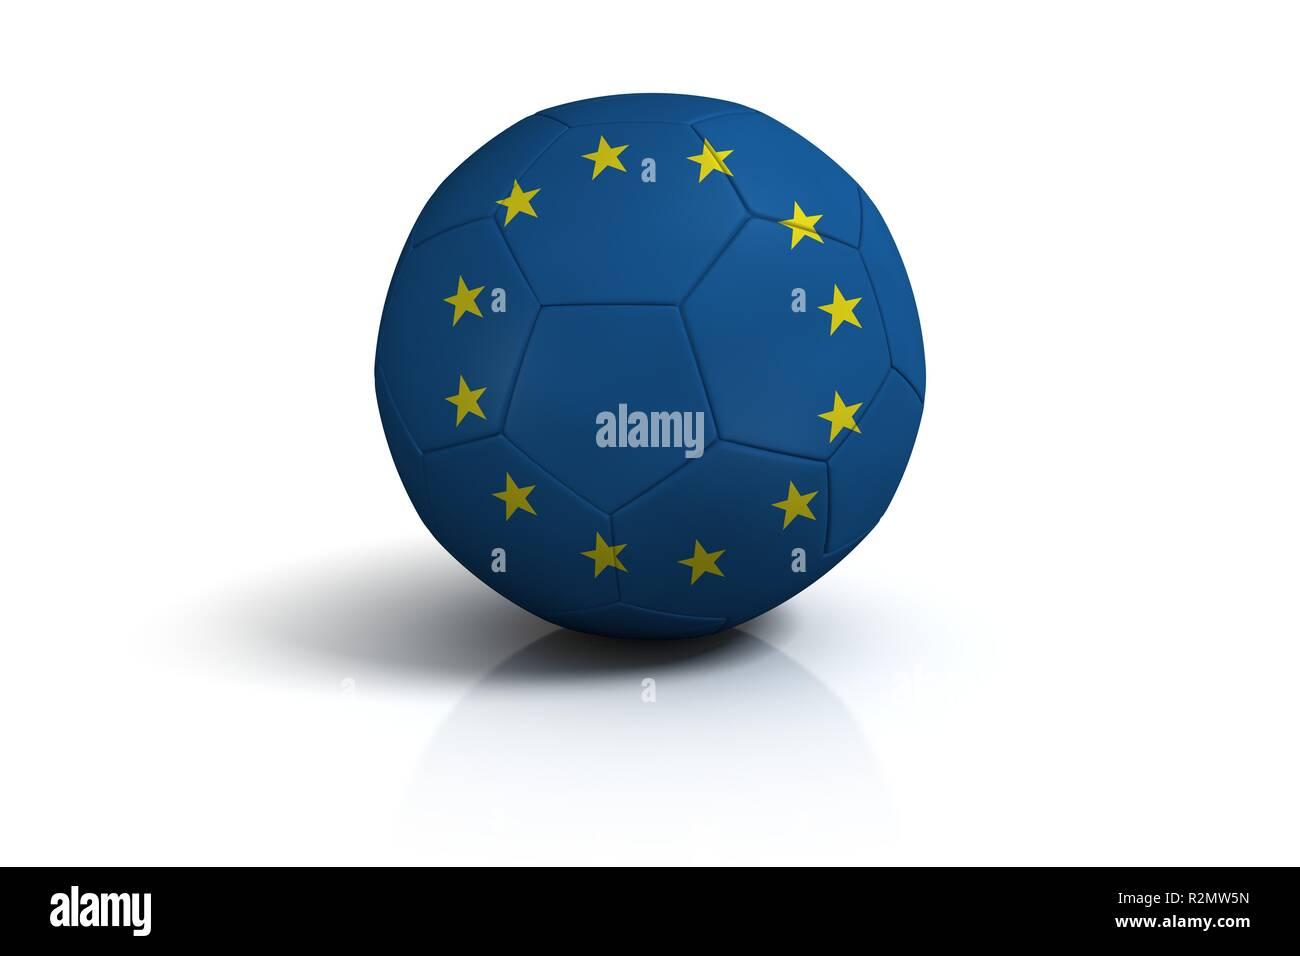 fussball europa - Stock Image